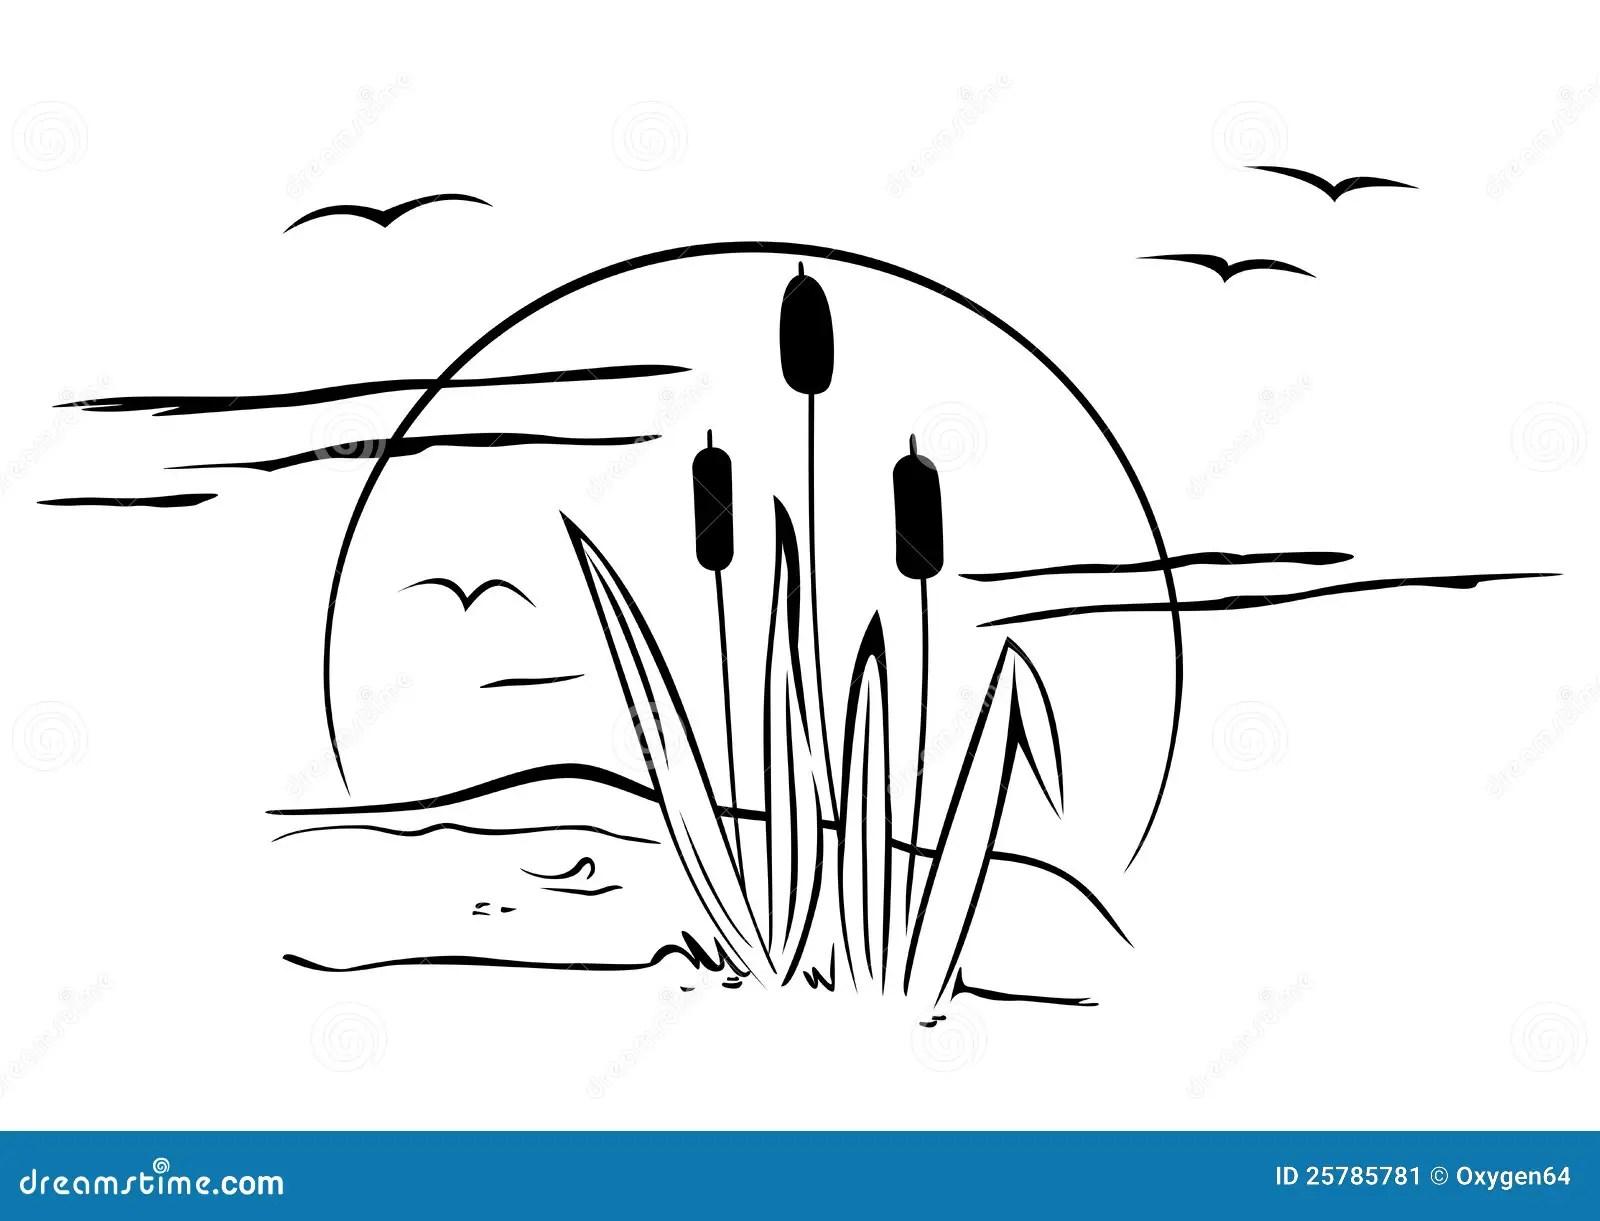 Cattails On Illustration Stock Vector Illustration Of